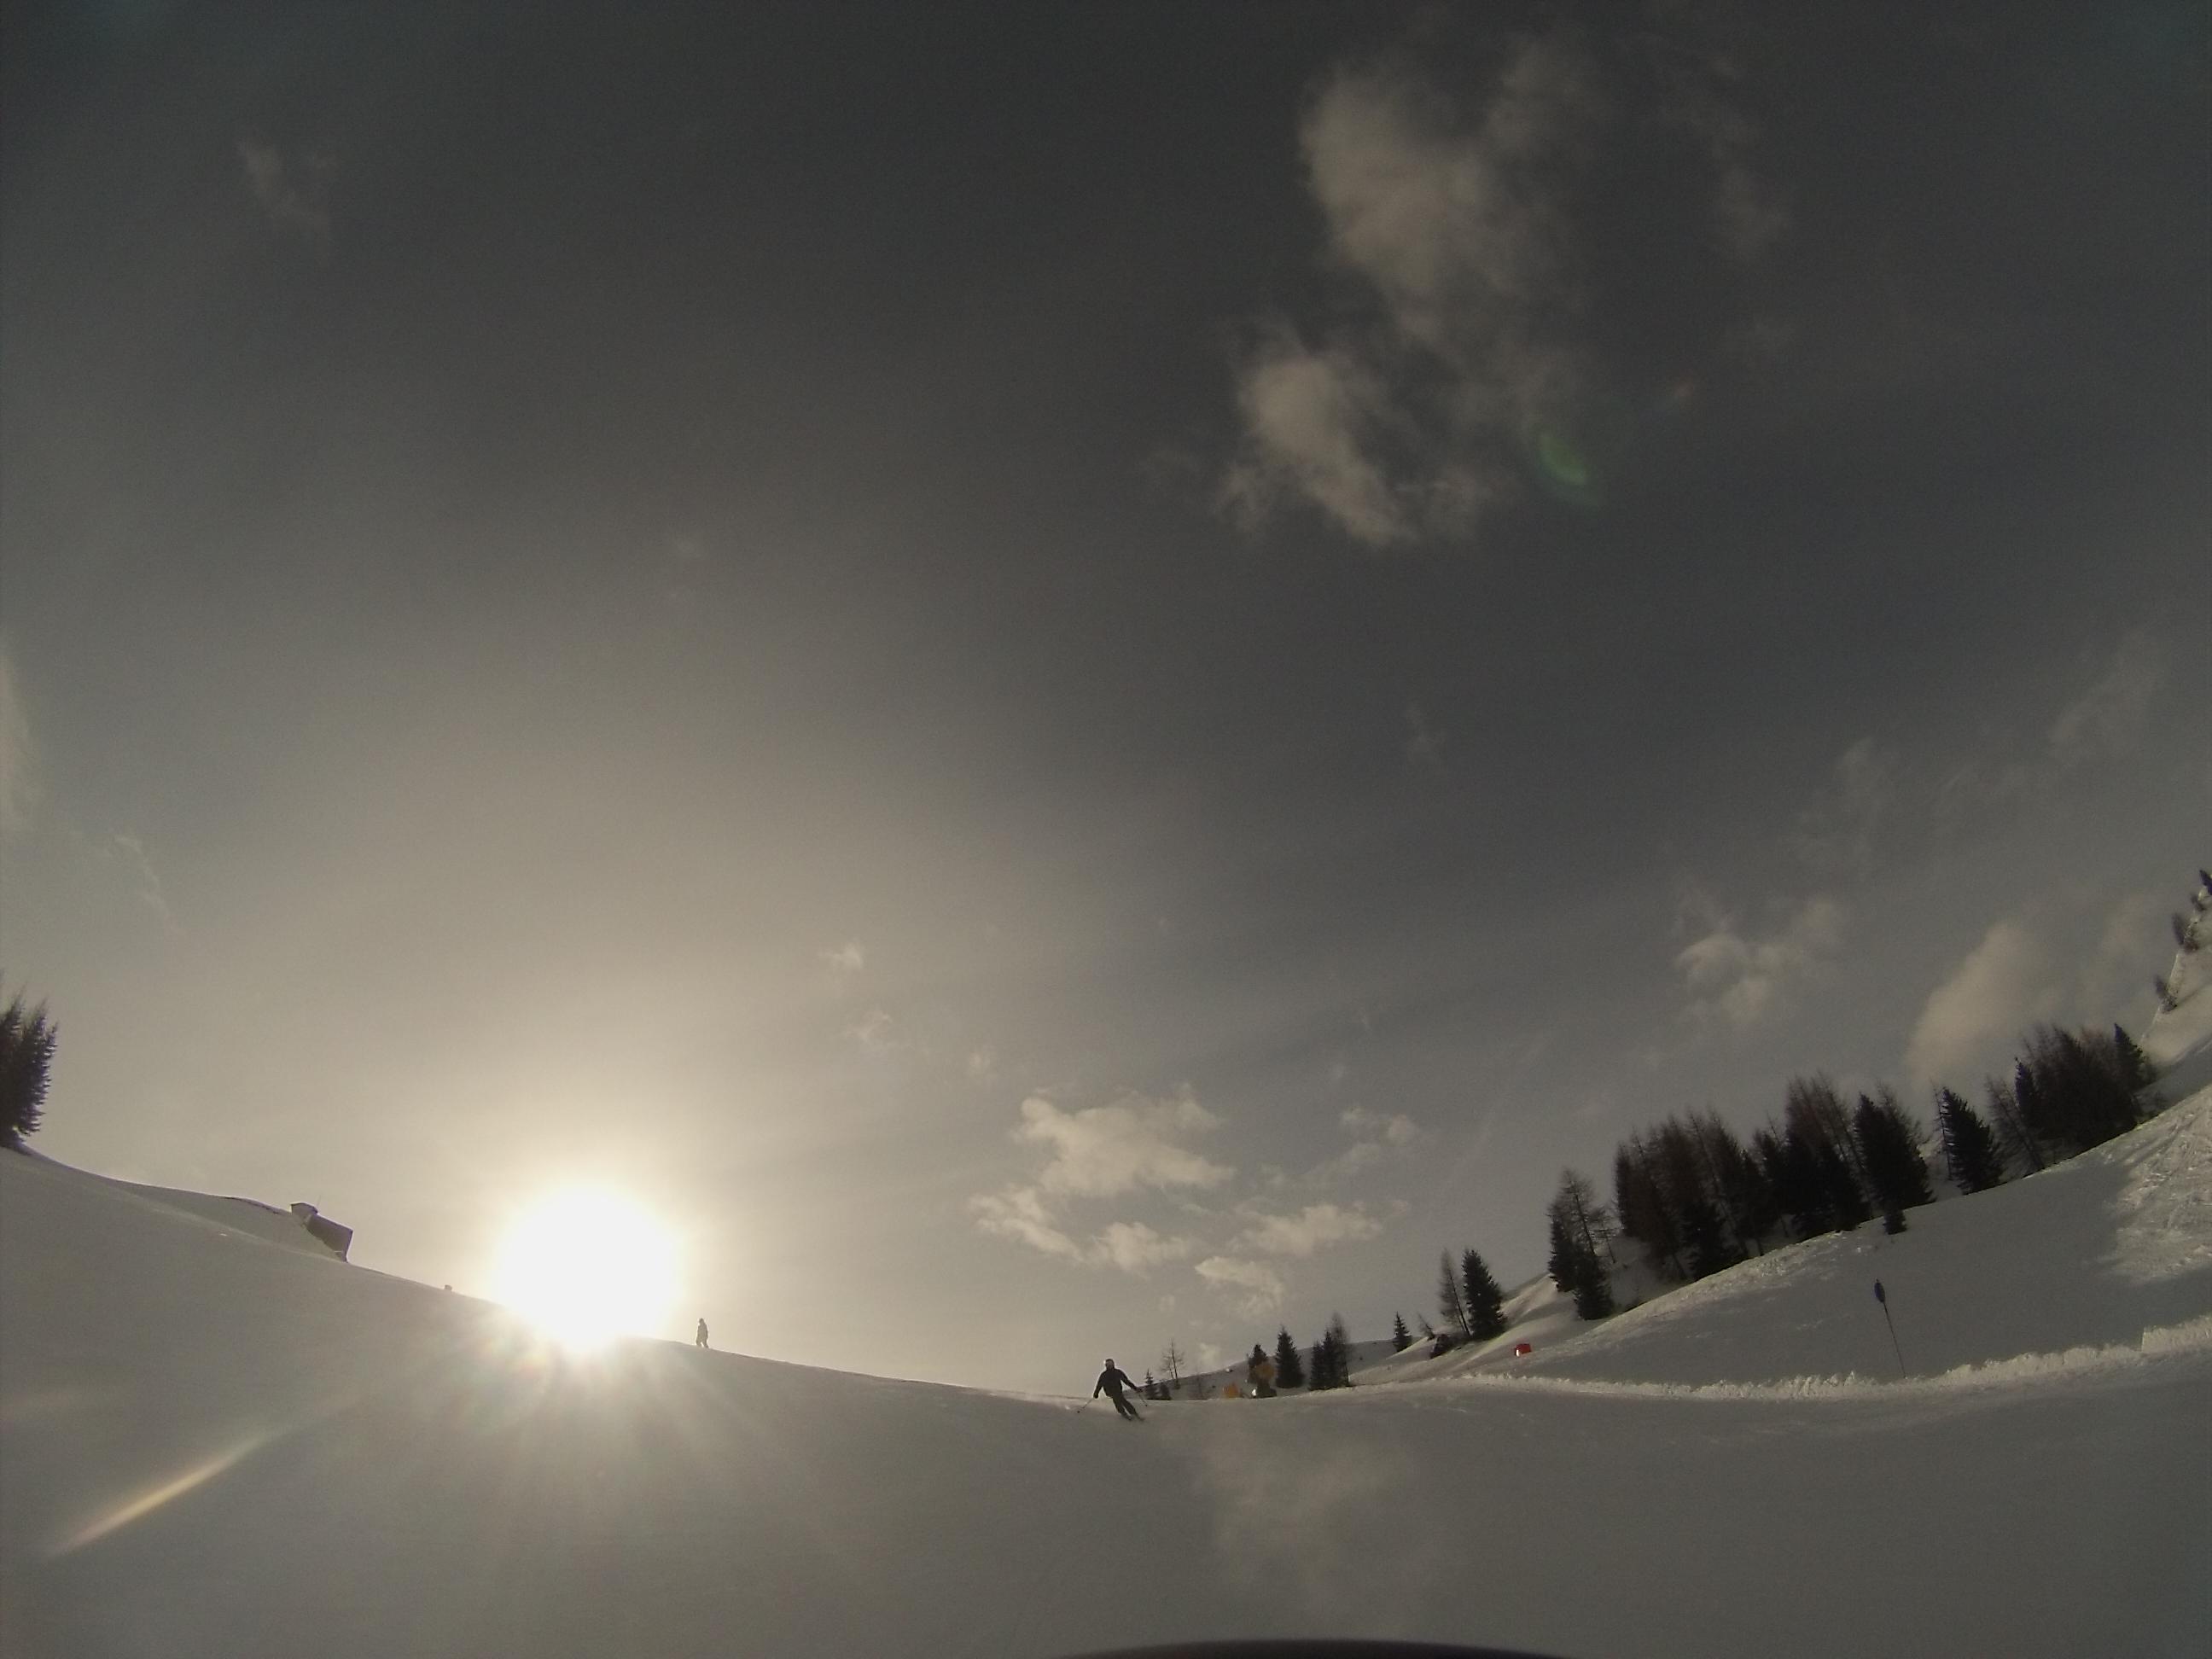 Skifahren, Chia-Samen, Technik und So…